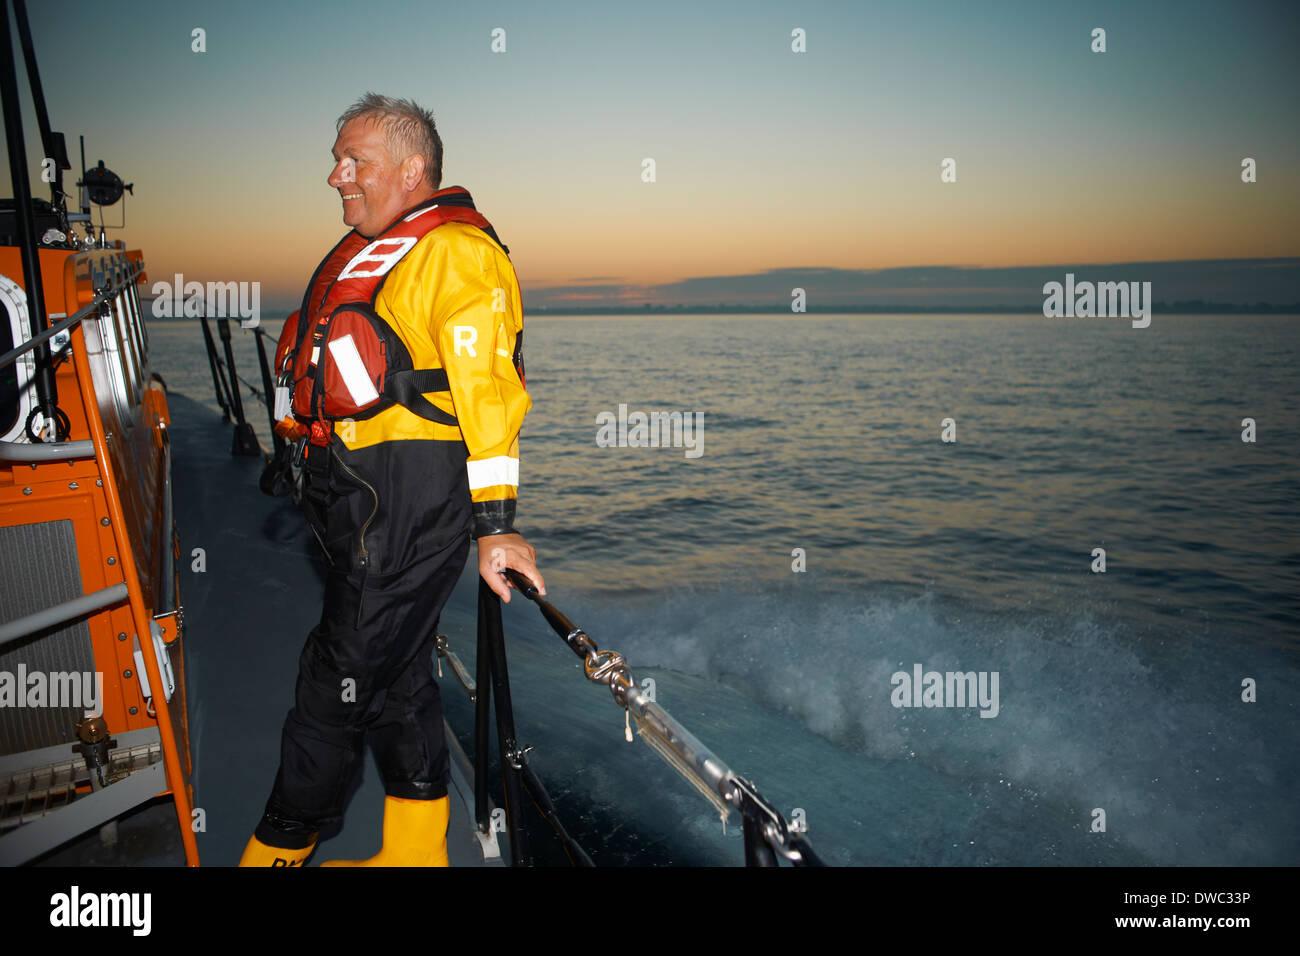 Portrait of mature man holding lifeboat railing at sea Stock Photo